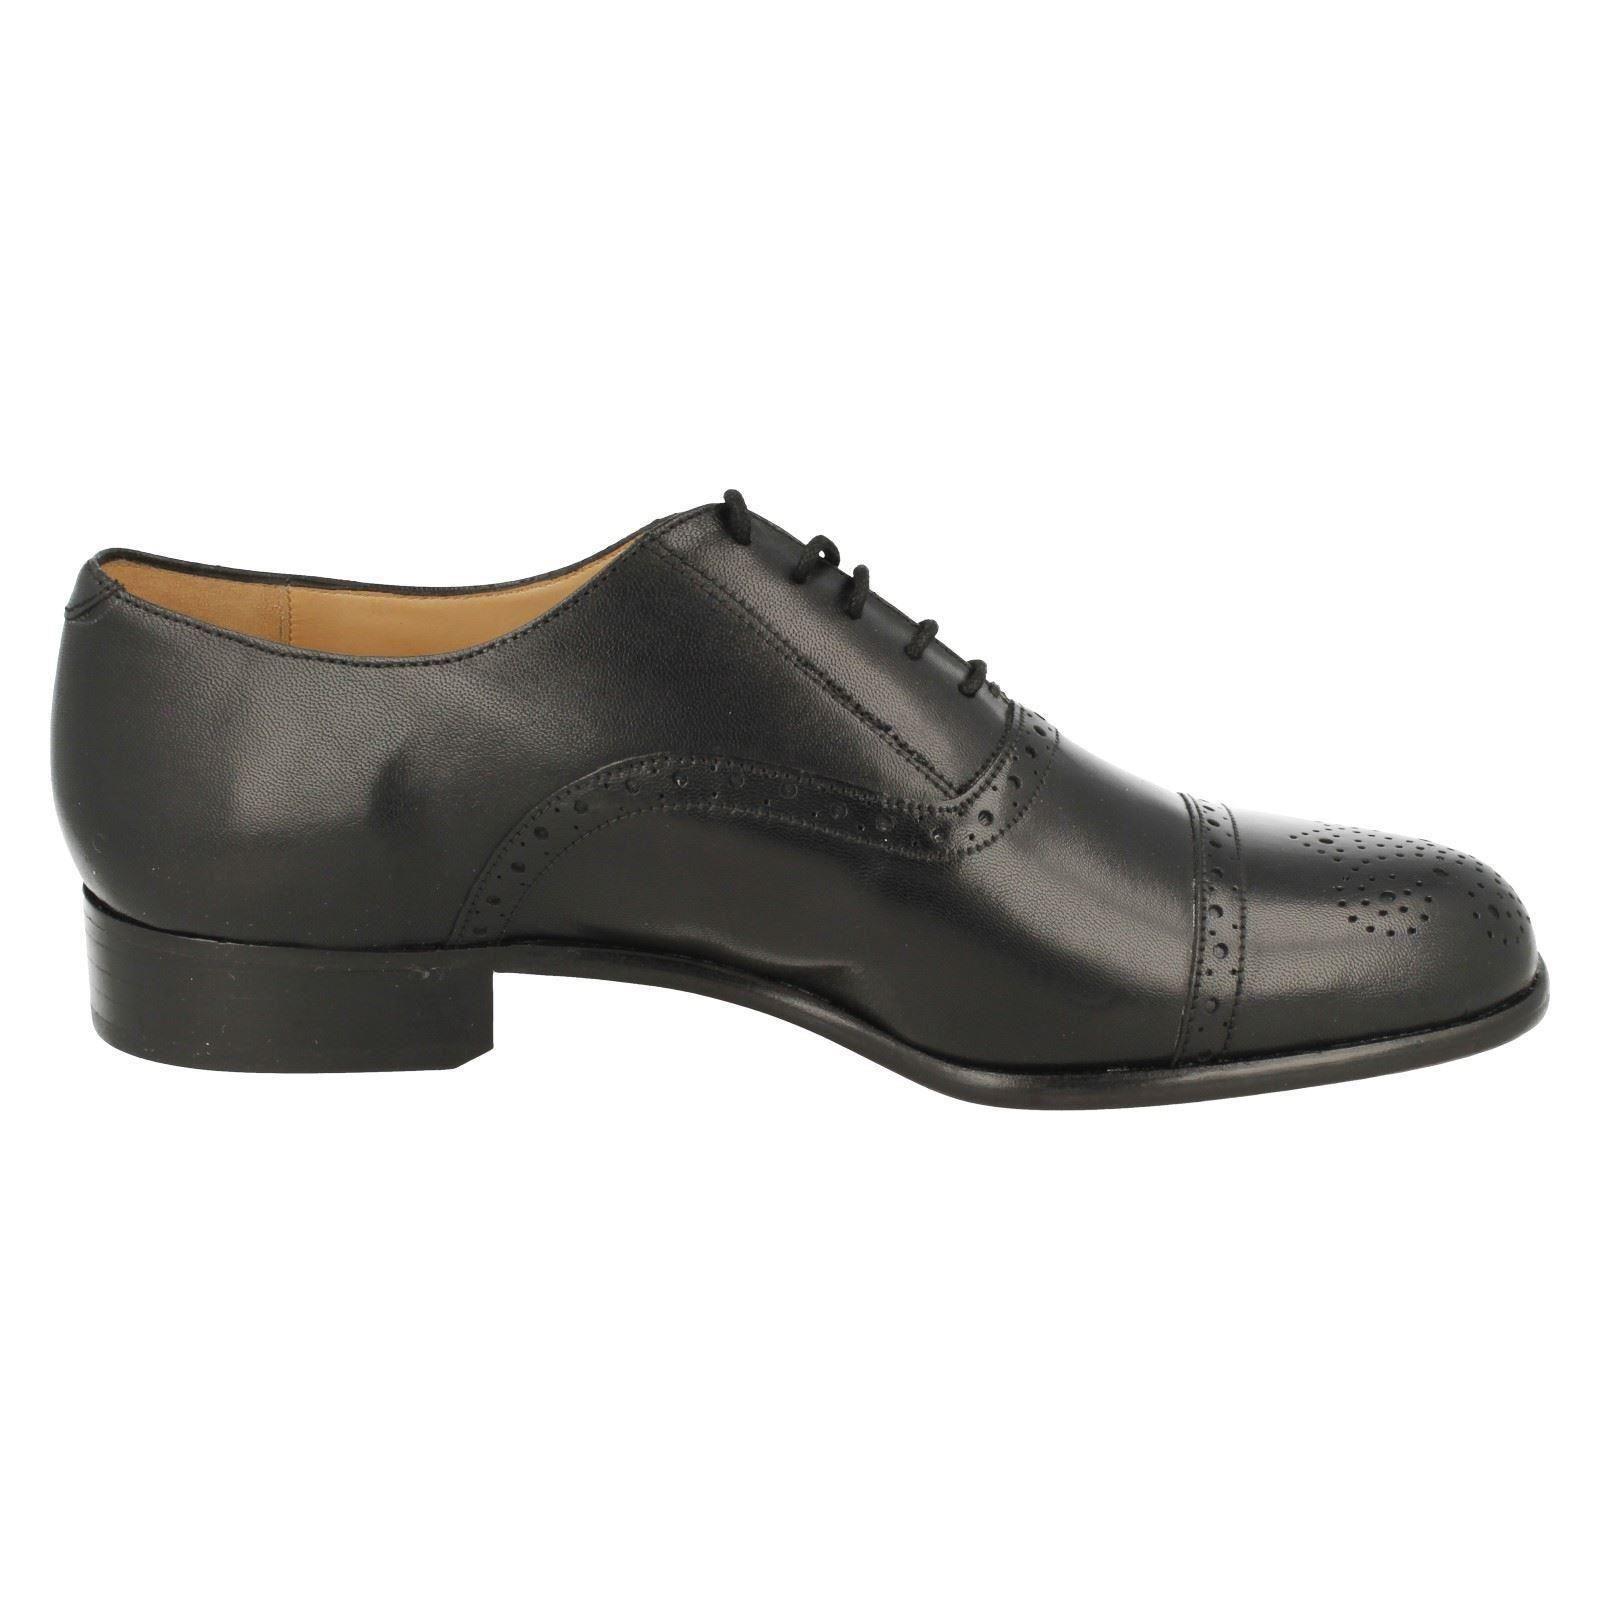 Uomo Brogue Grenson Brogue Uomo Schuhes ST. Pancras 148608